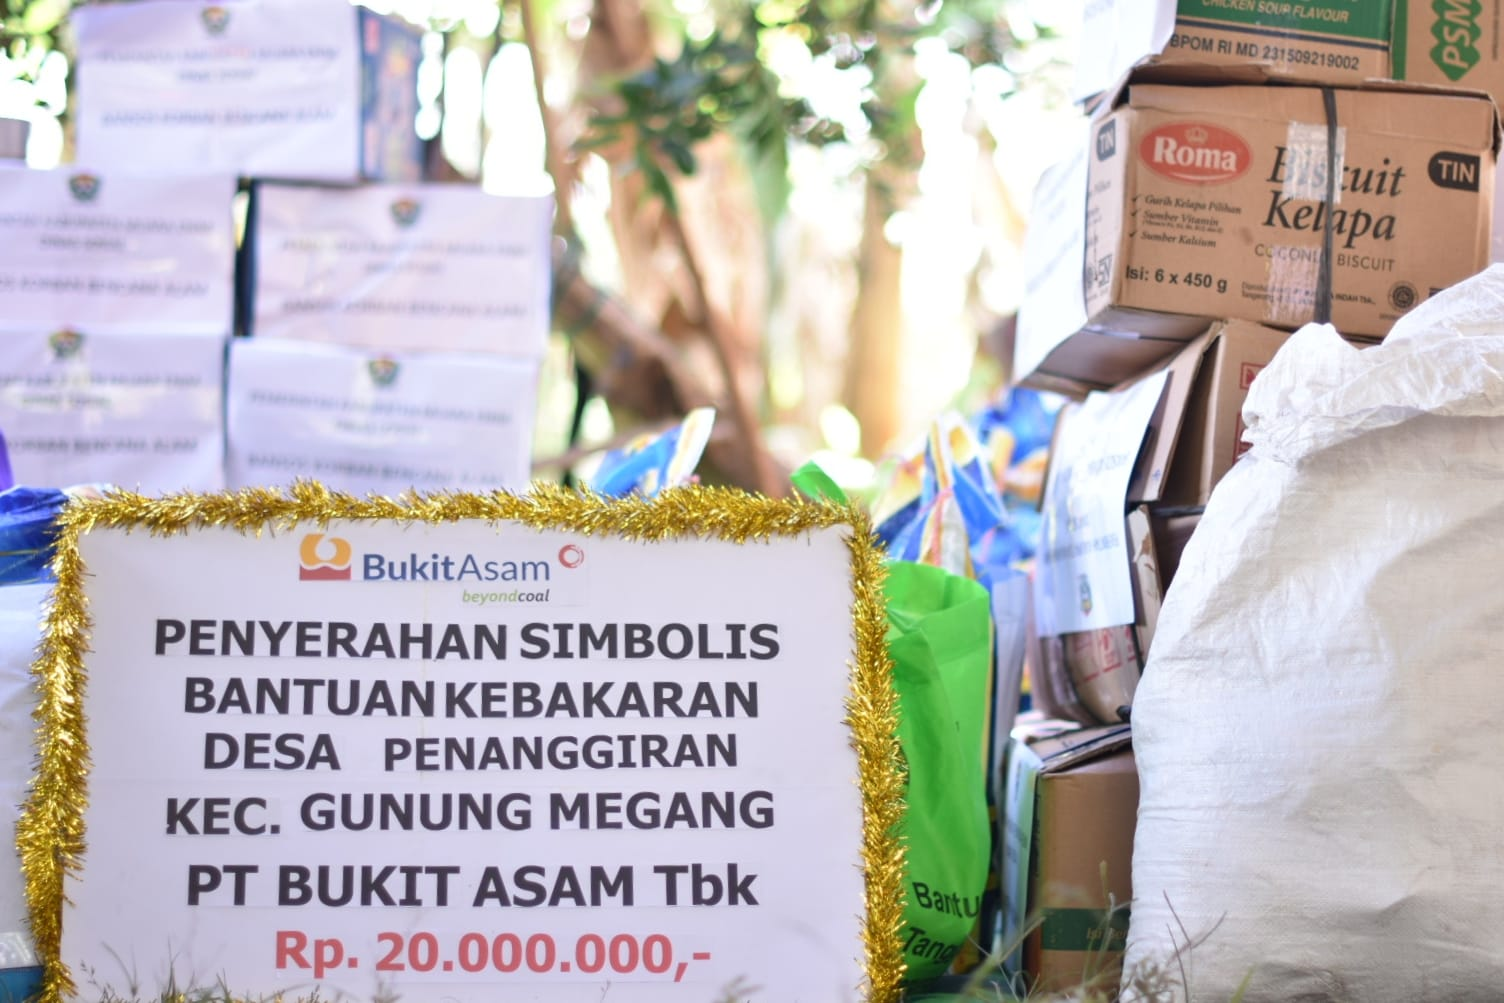 PT Bukit Asam Tbk menyalurkan santunan bagi korban kebakaran di desa Penanggiran, Kabupaten Muara Enim sebesar Rp20 juta